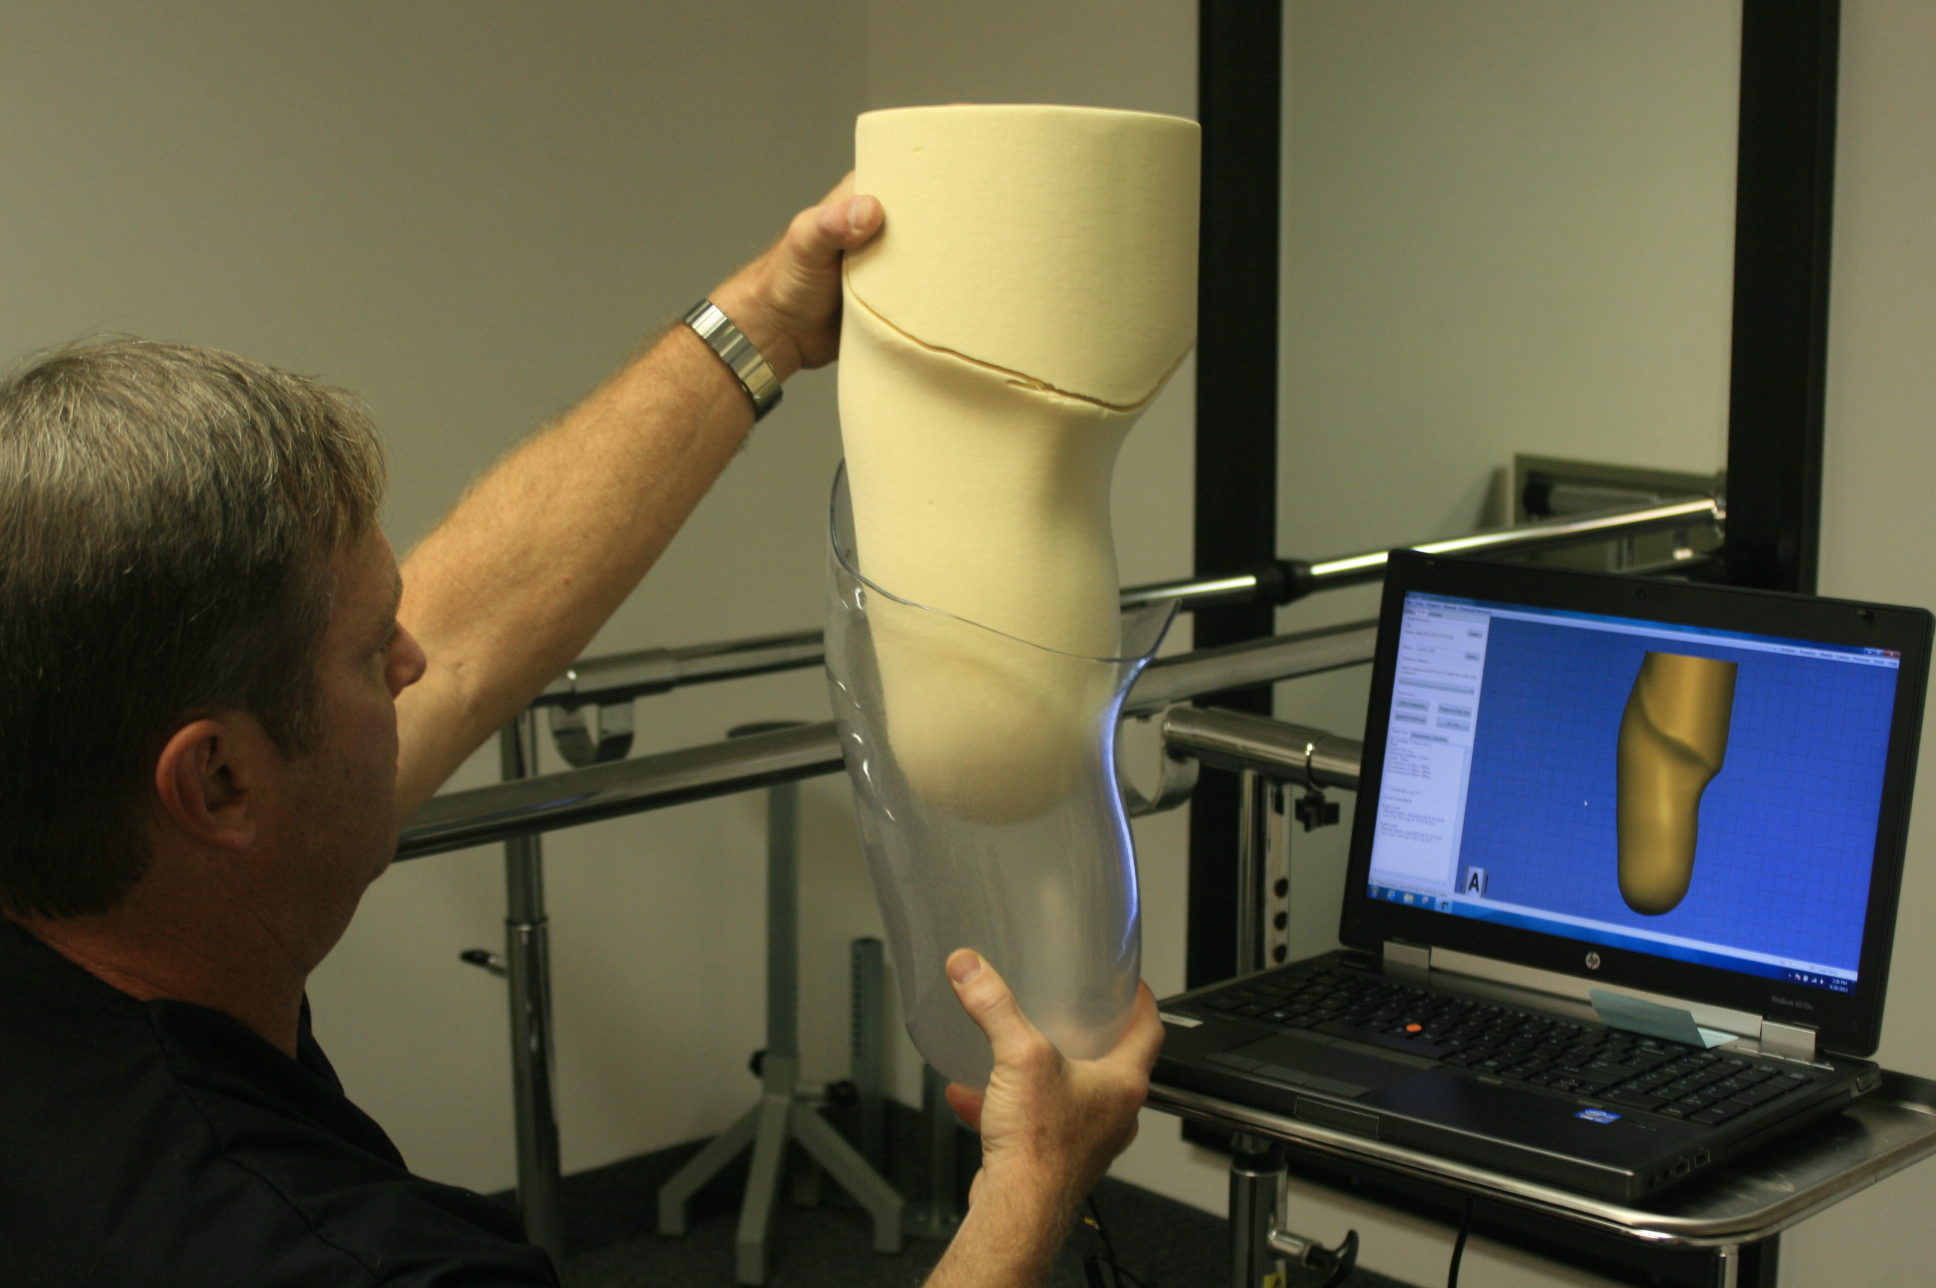 Miller Prosthetics & Orthotics